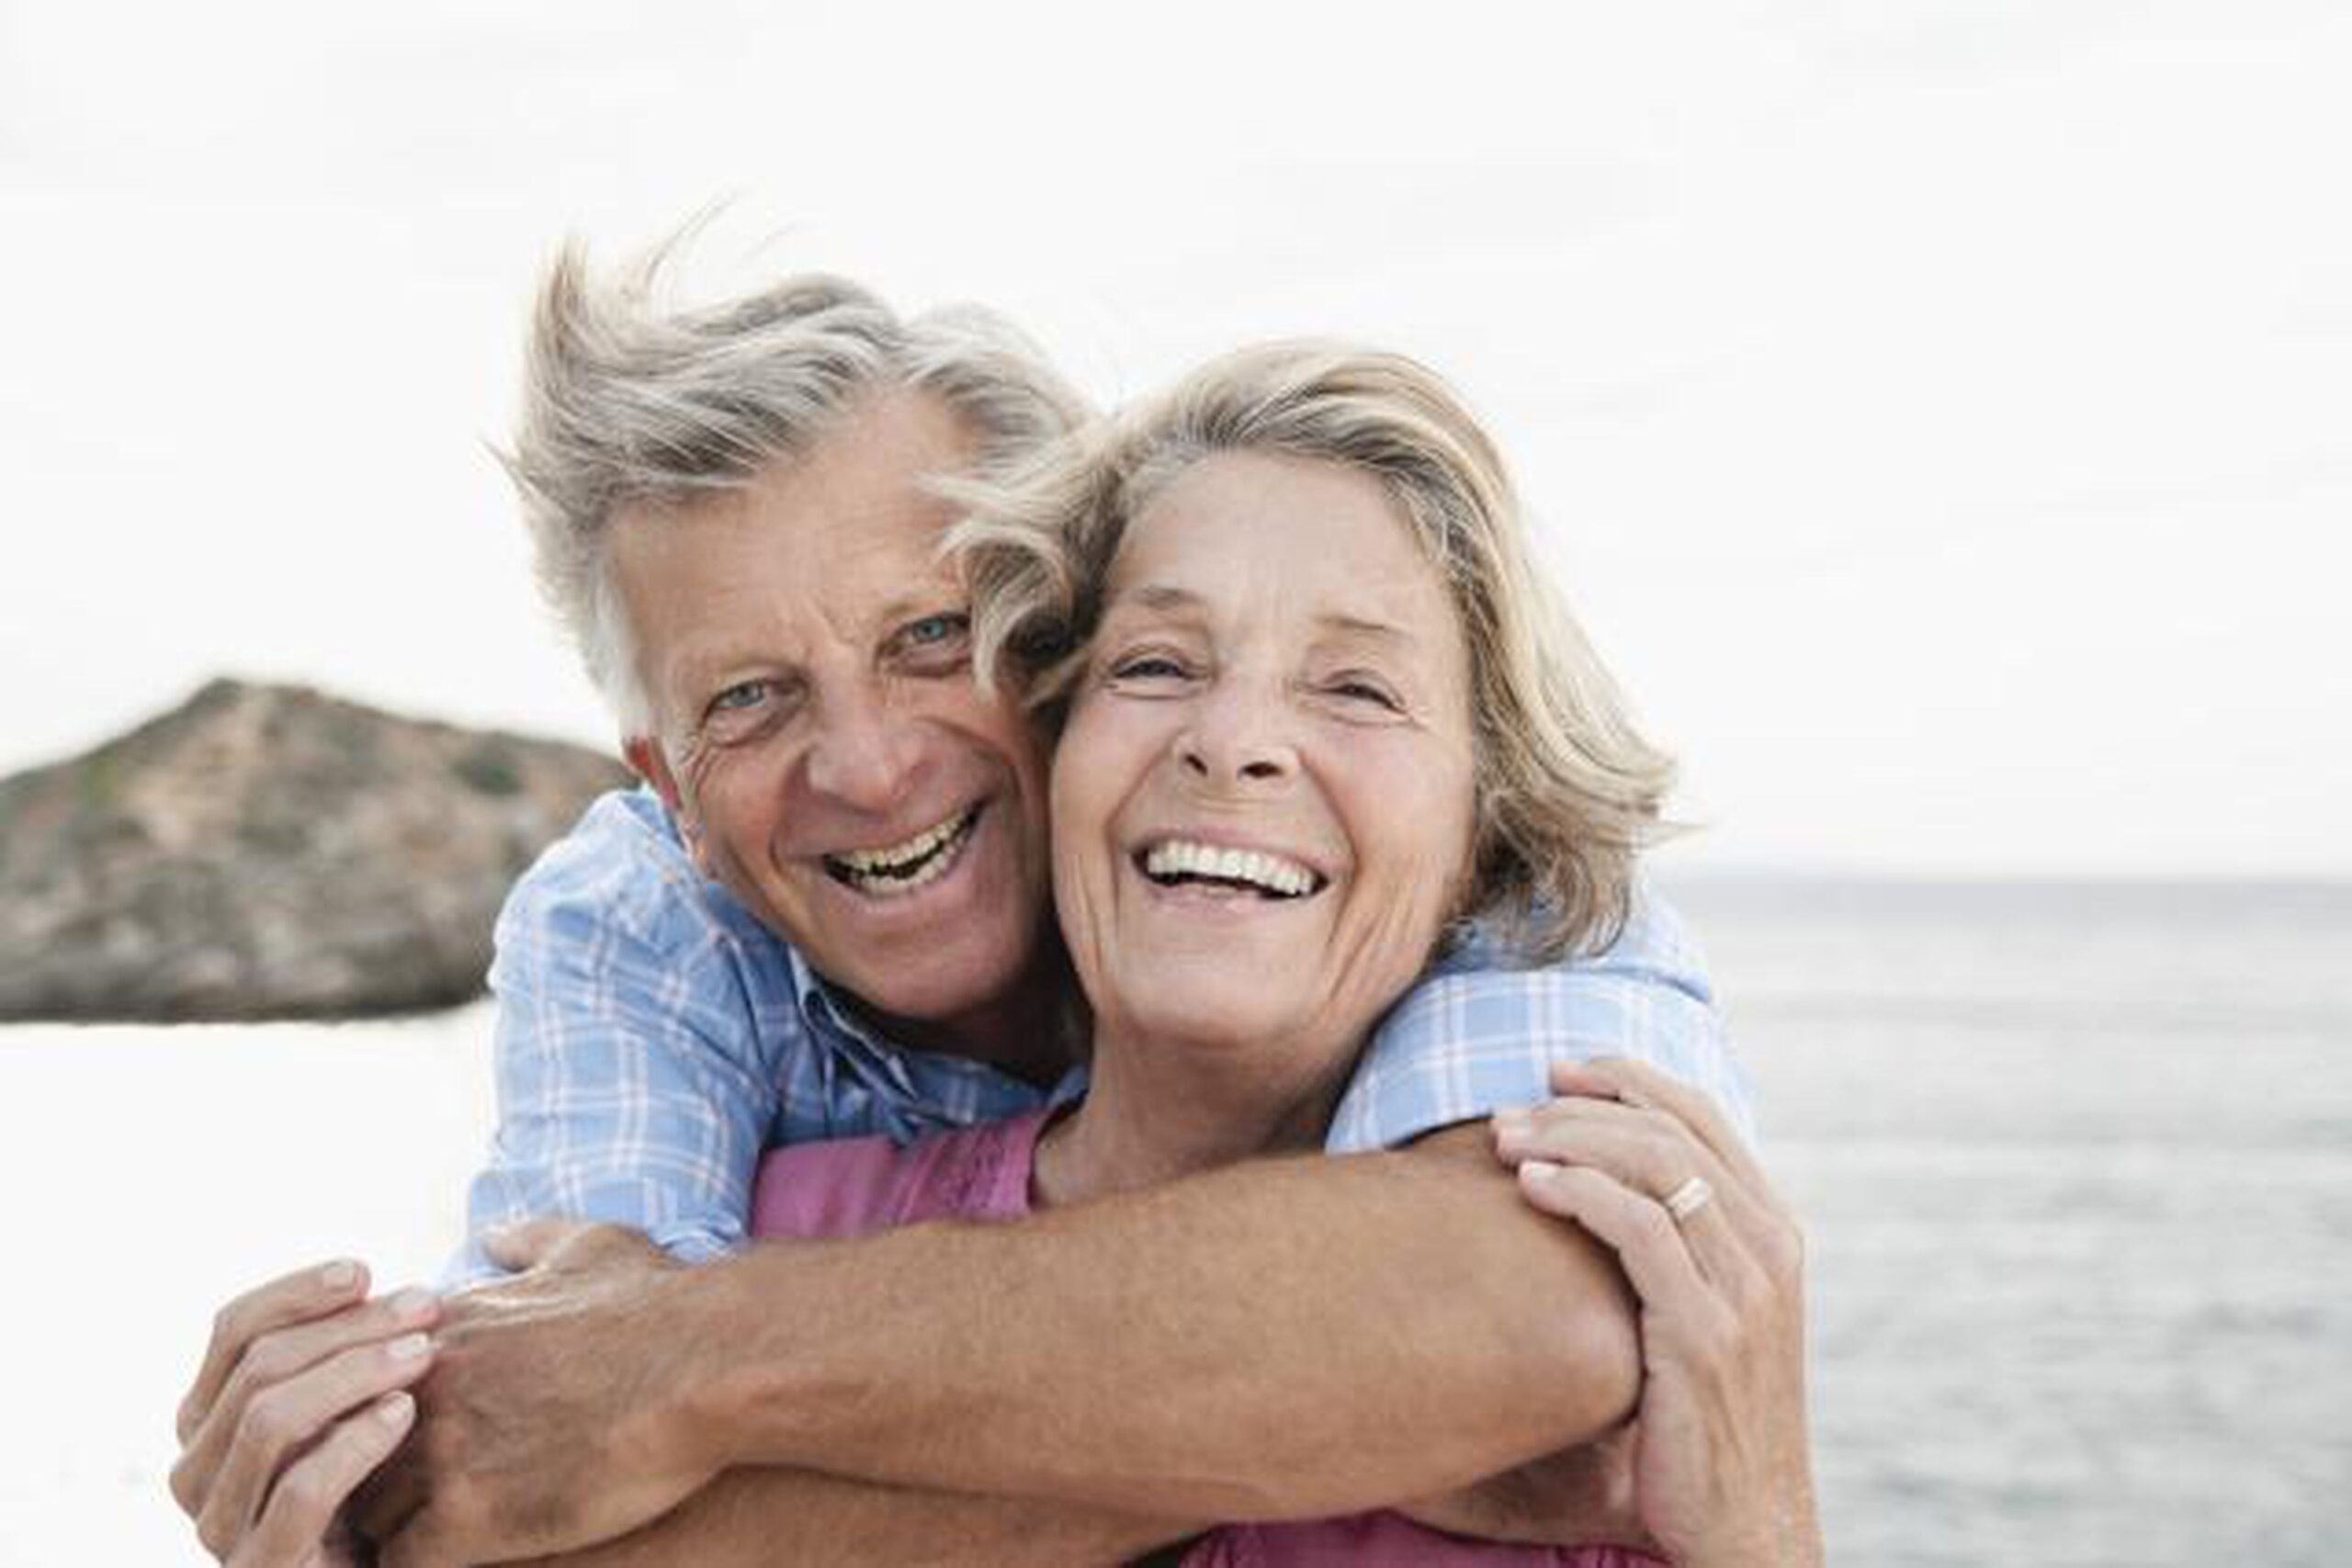 Happy_Retirement_163252545_Westend61-56a635893df78cf7728bd837